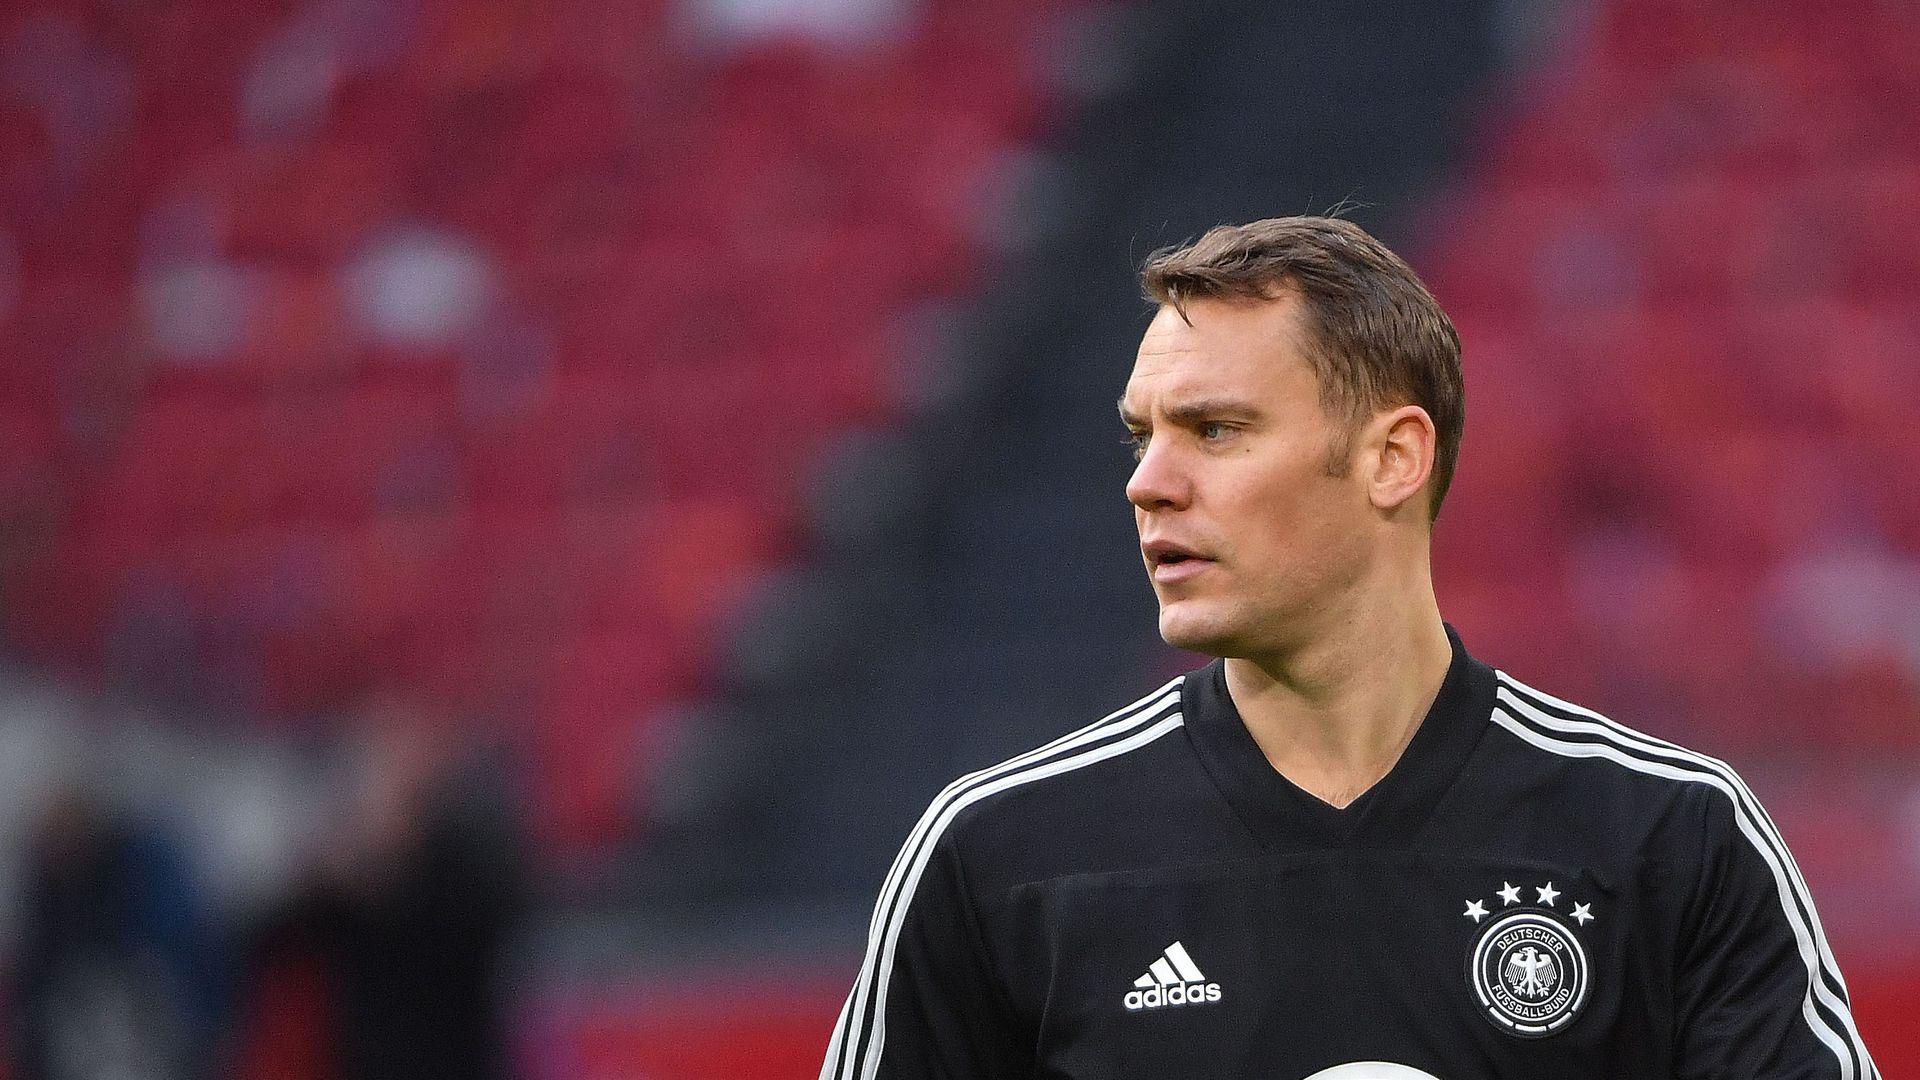 Manuel Neuer Instagram